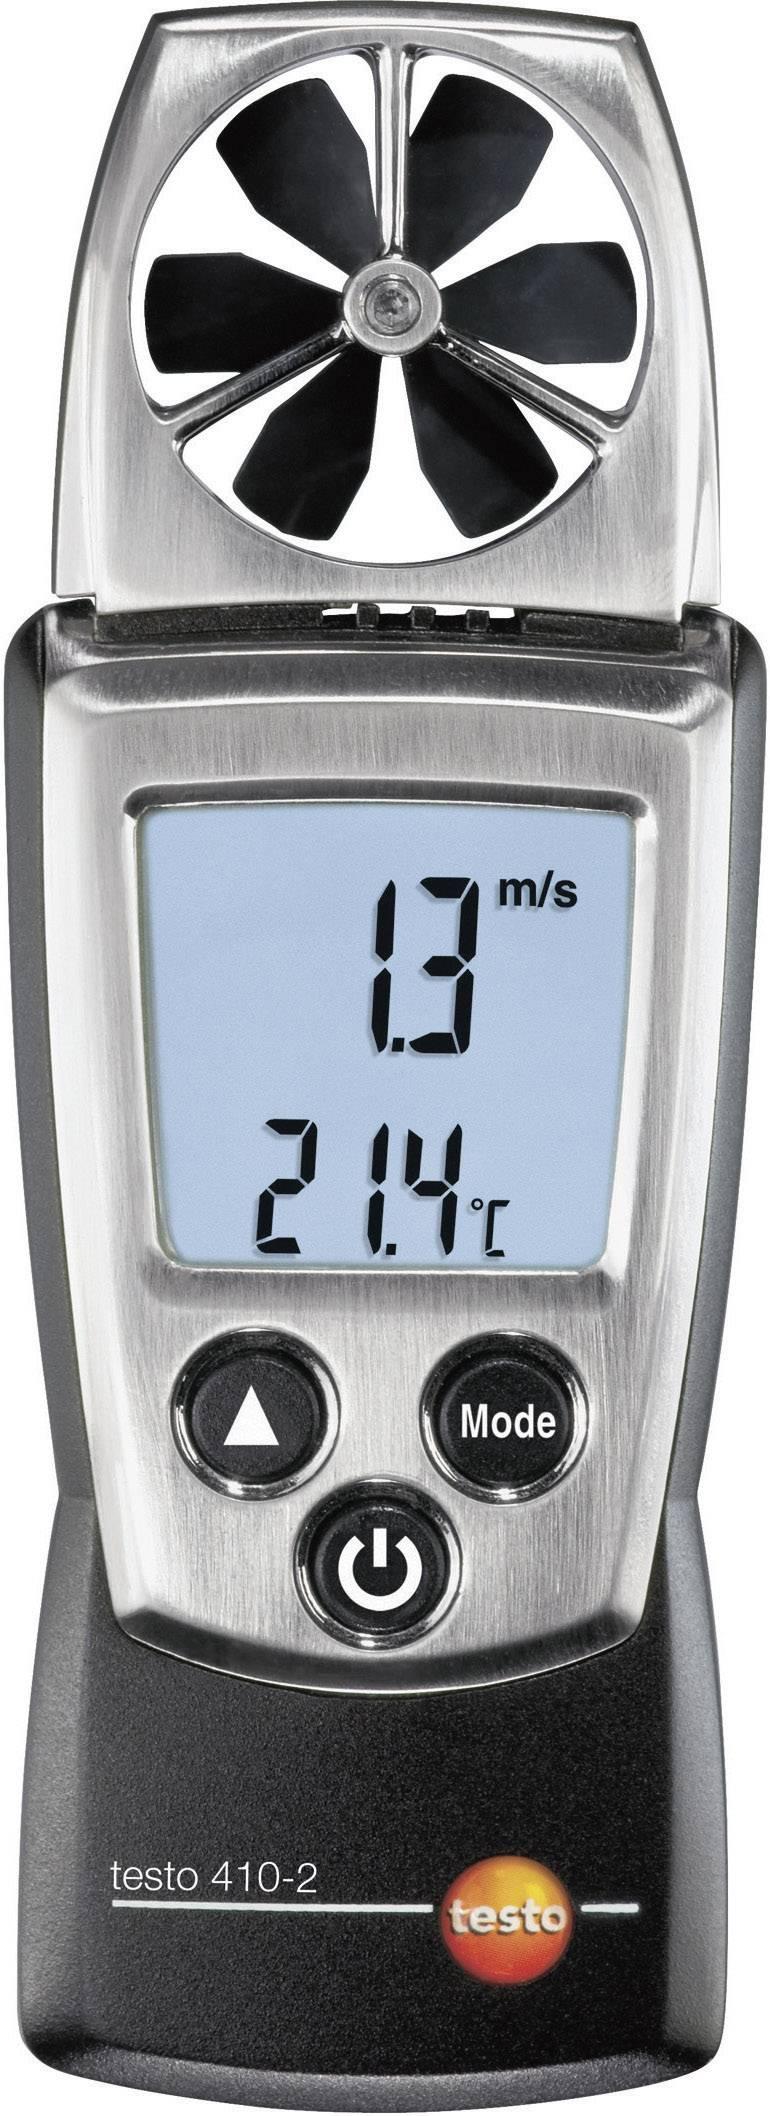 Anemometer testo 410-2, 0.4 - 20 m/s